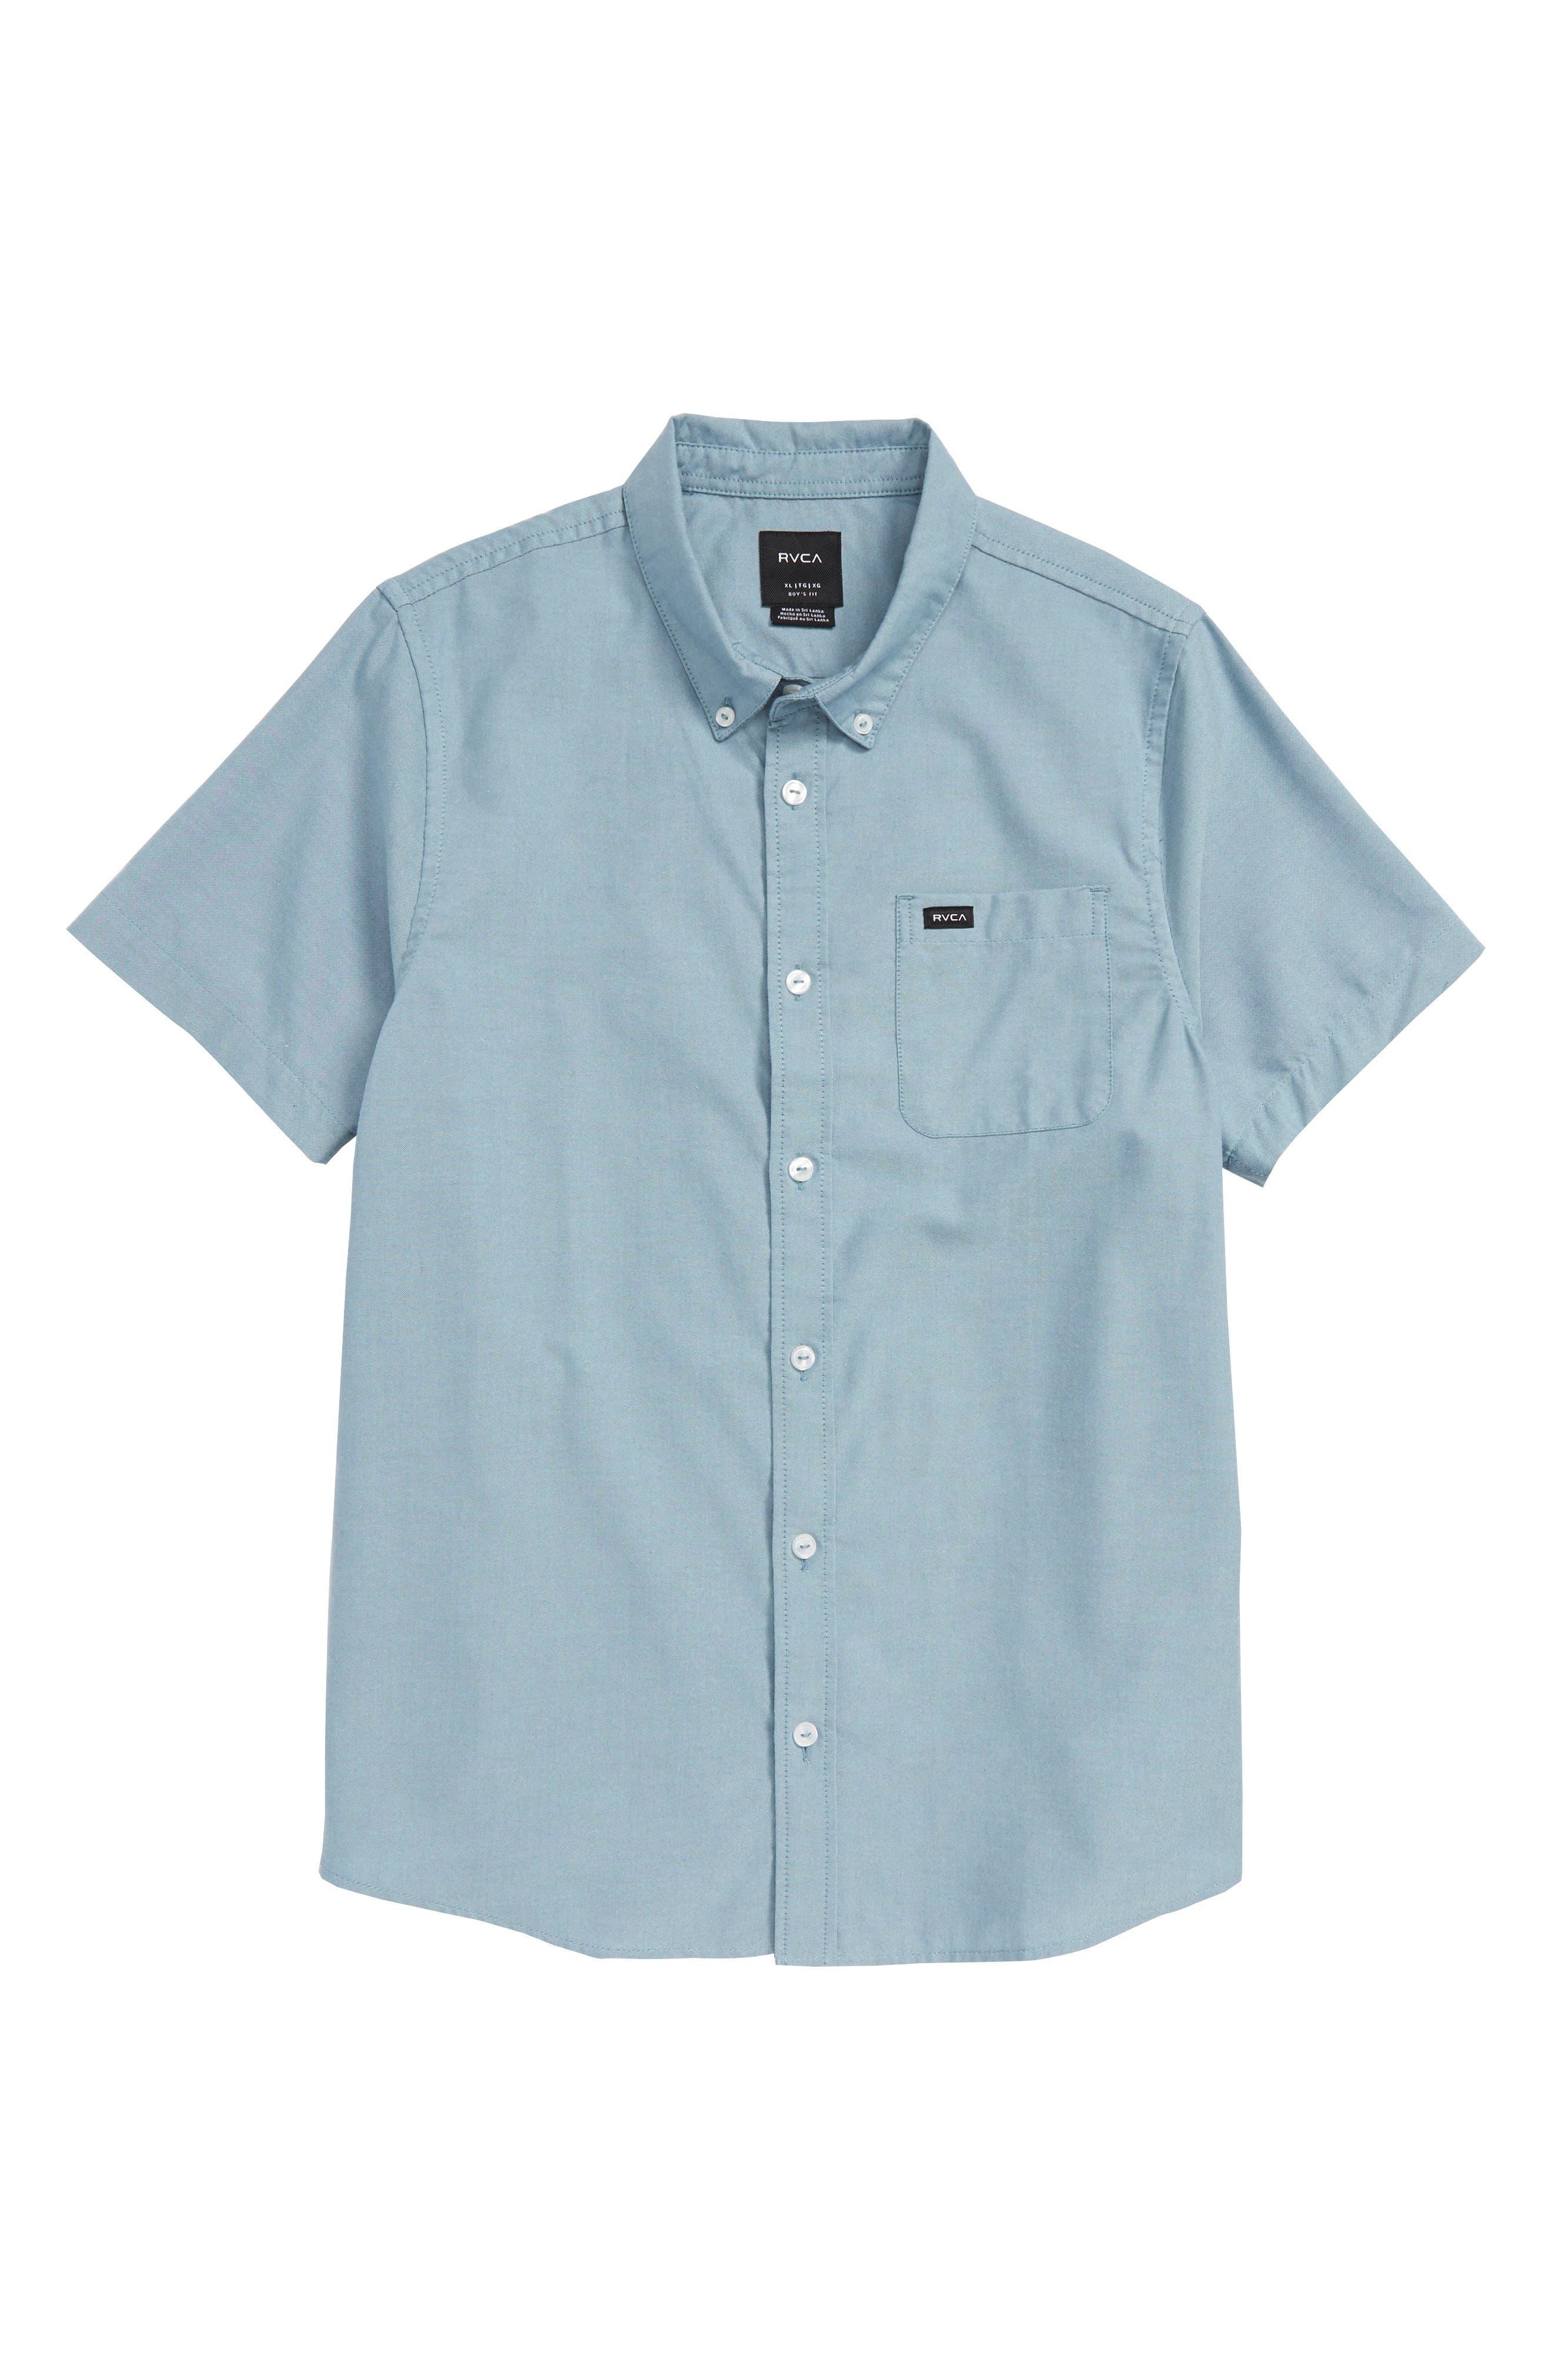 'That'll Do' Woven Shirt,                             Main thumbnail 5, color,